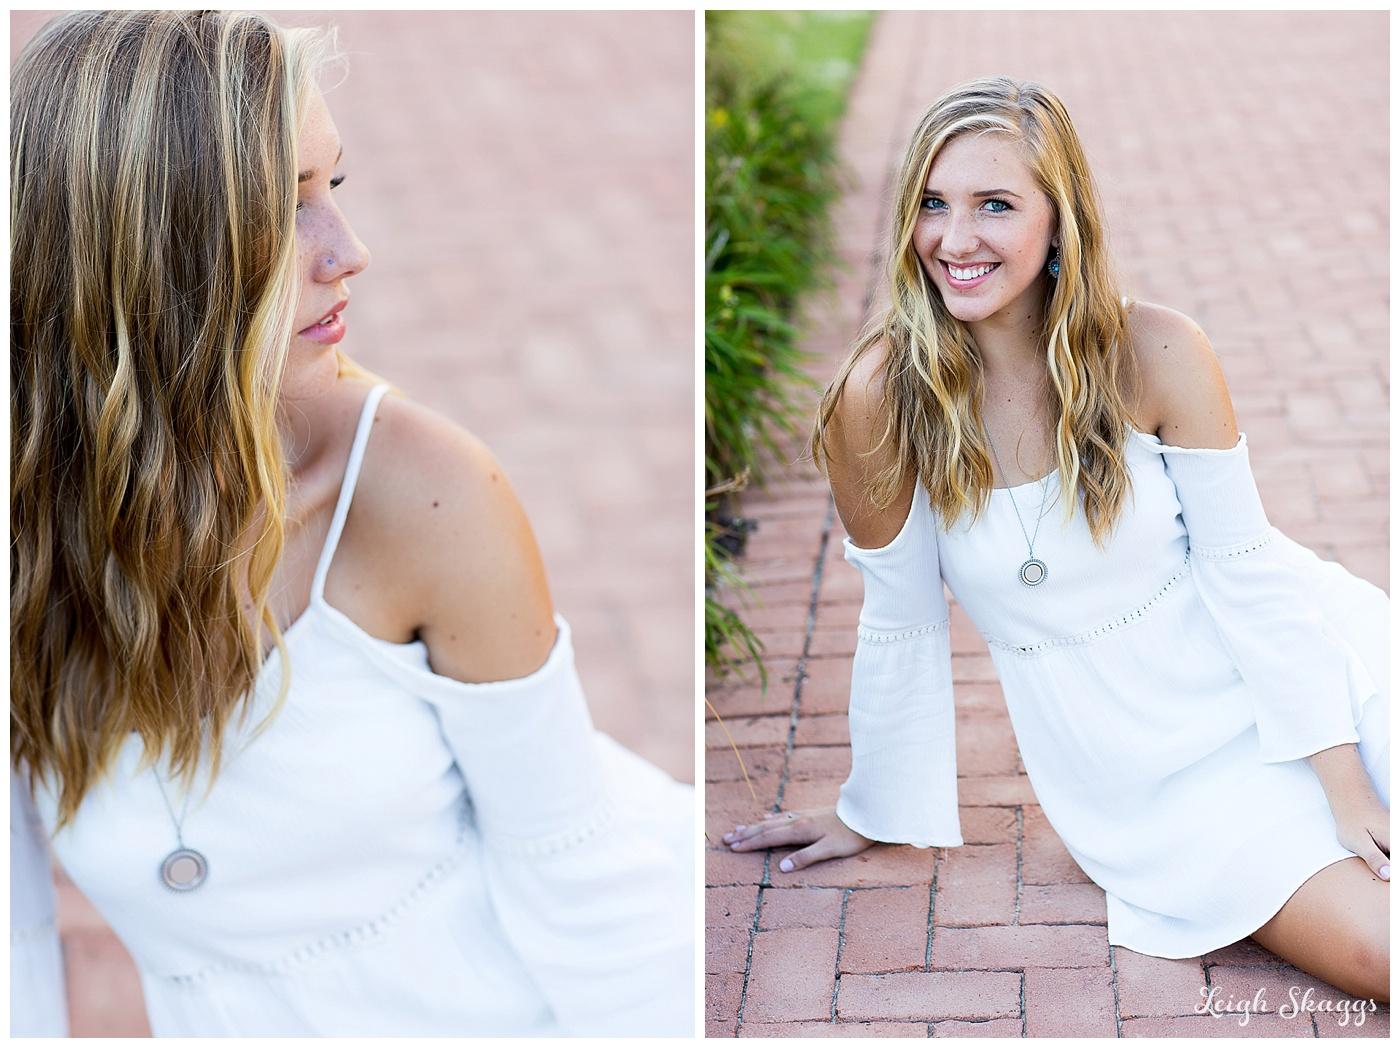 Natalie is a Senior!!  An East Beach Senior Portrait session!